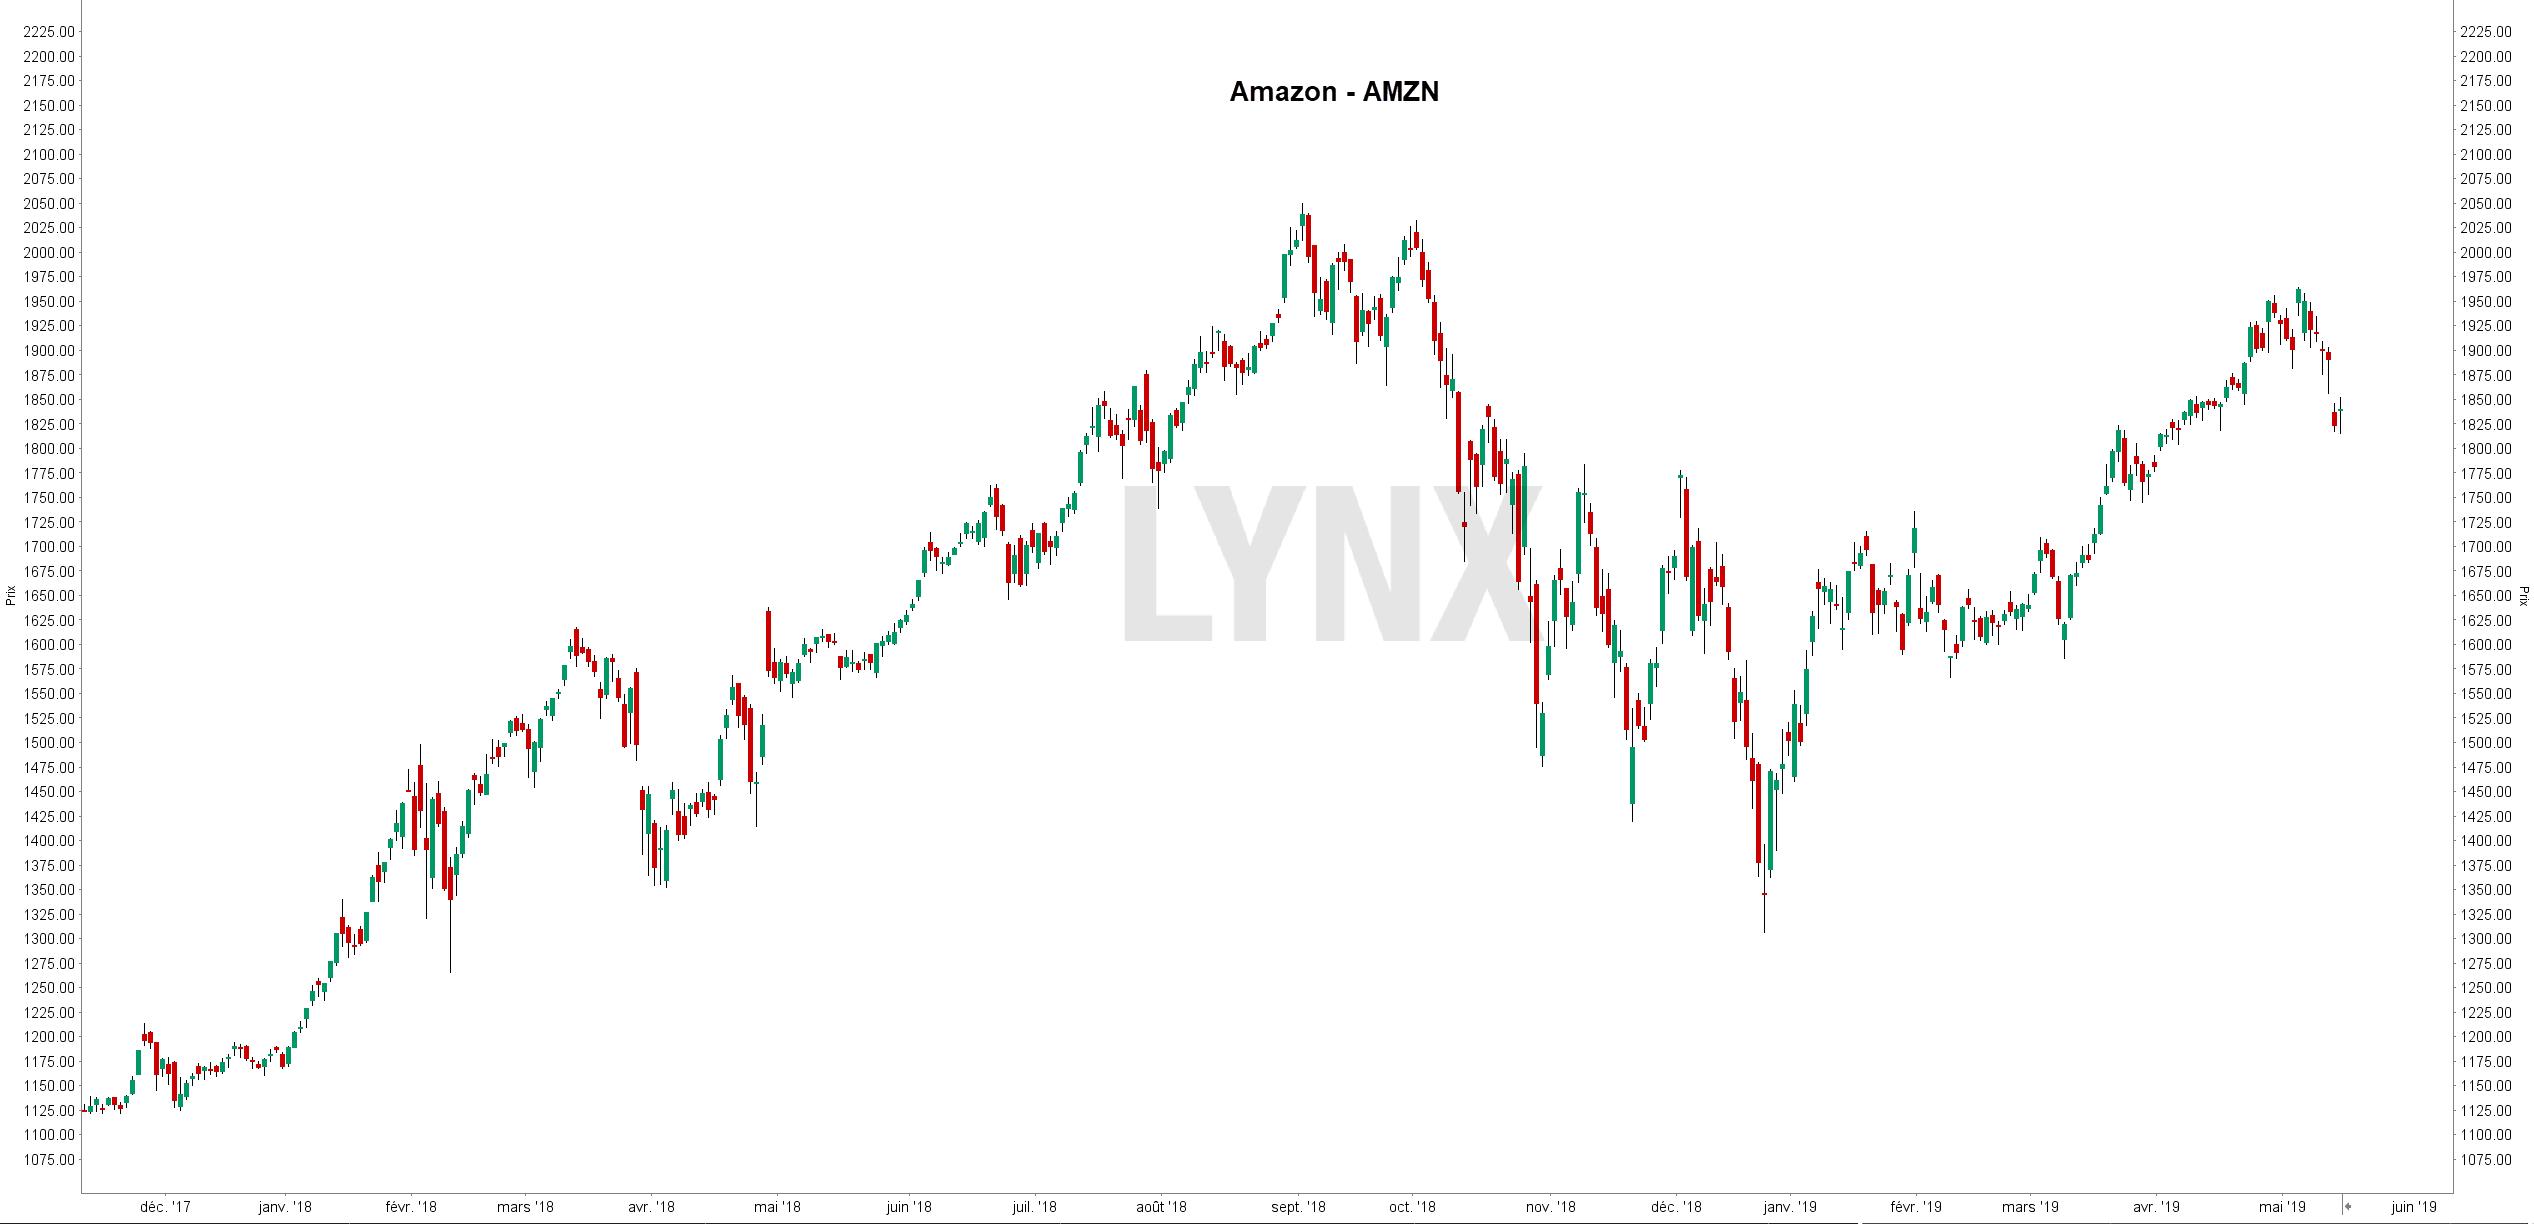 Amazon S&P 500 - FANG